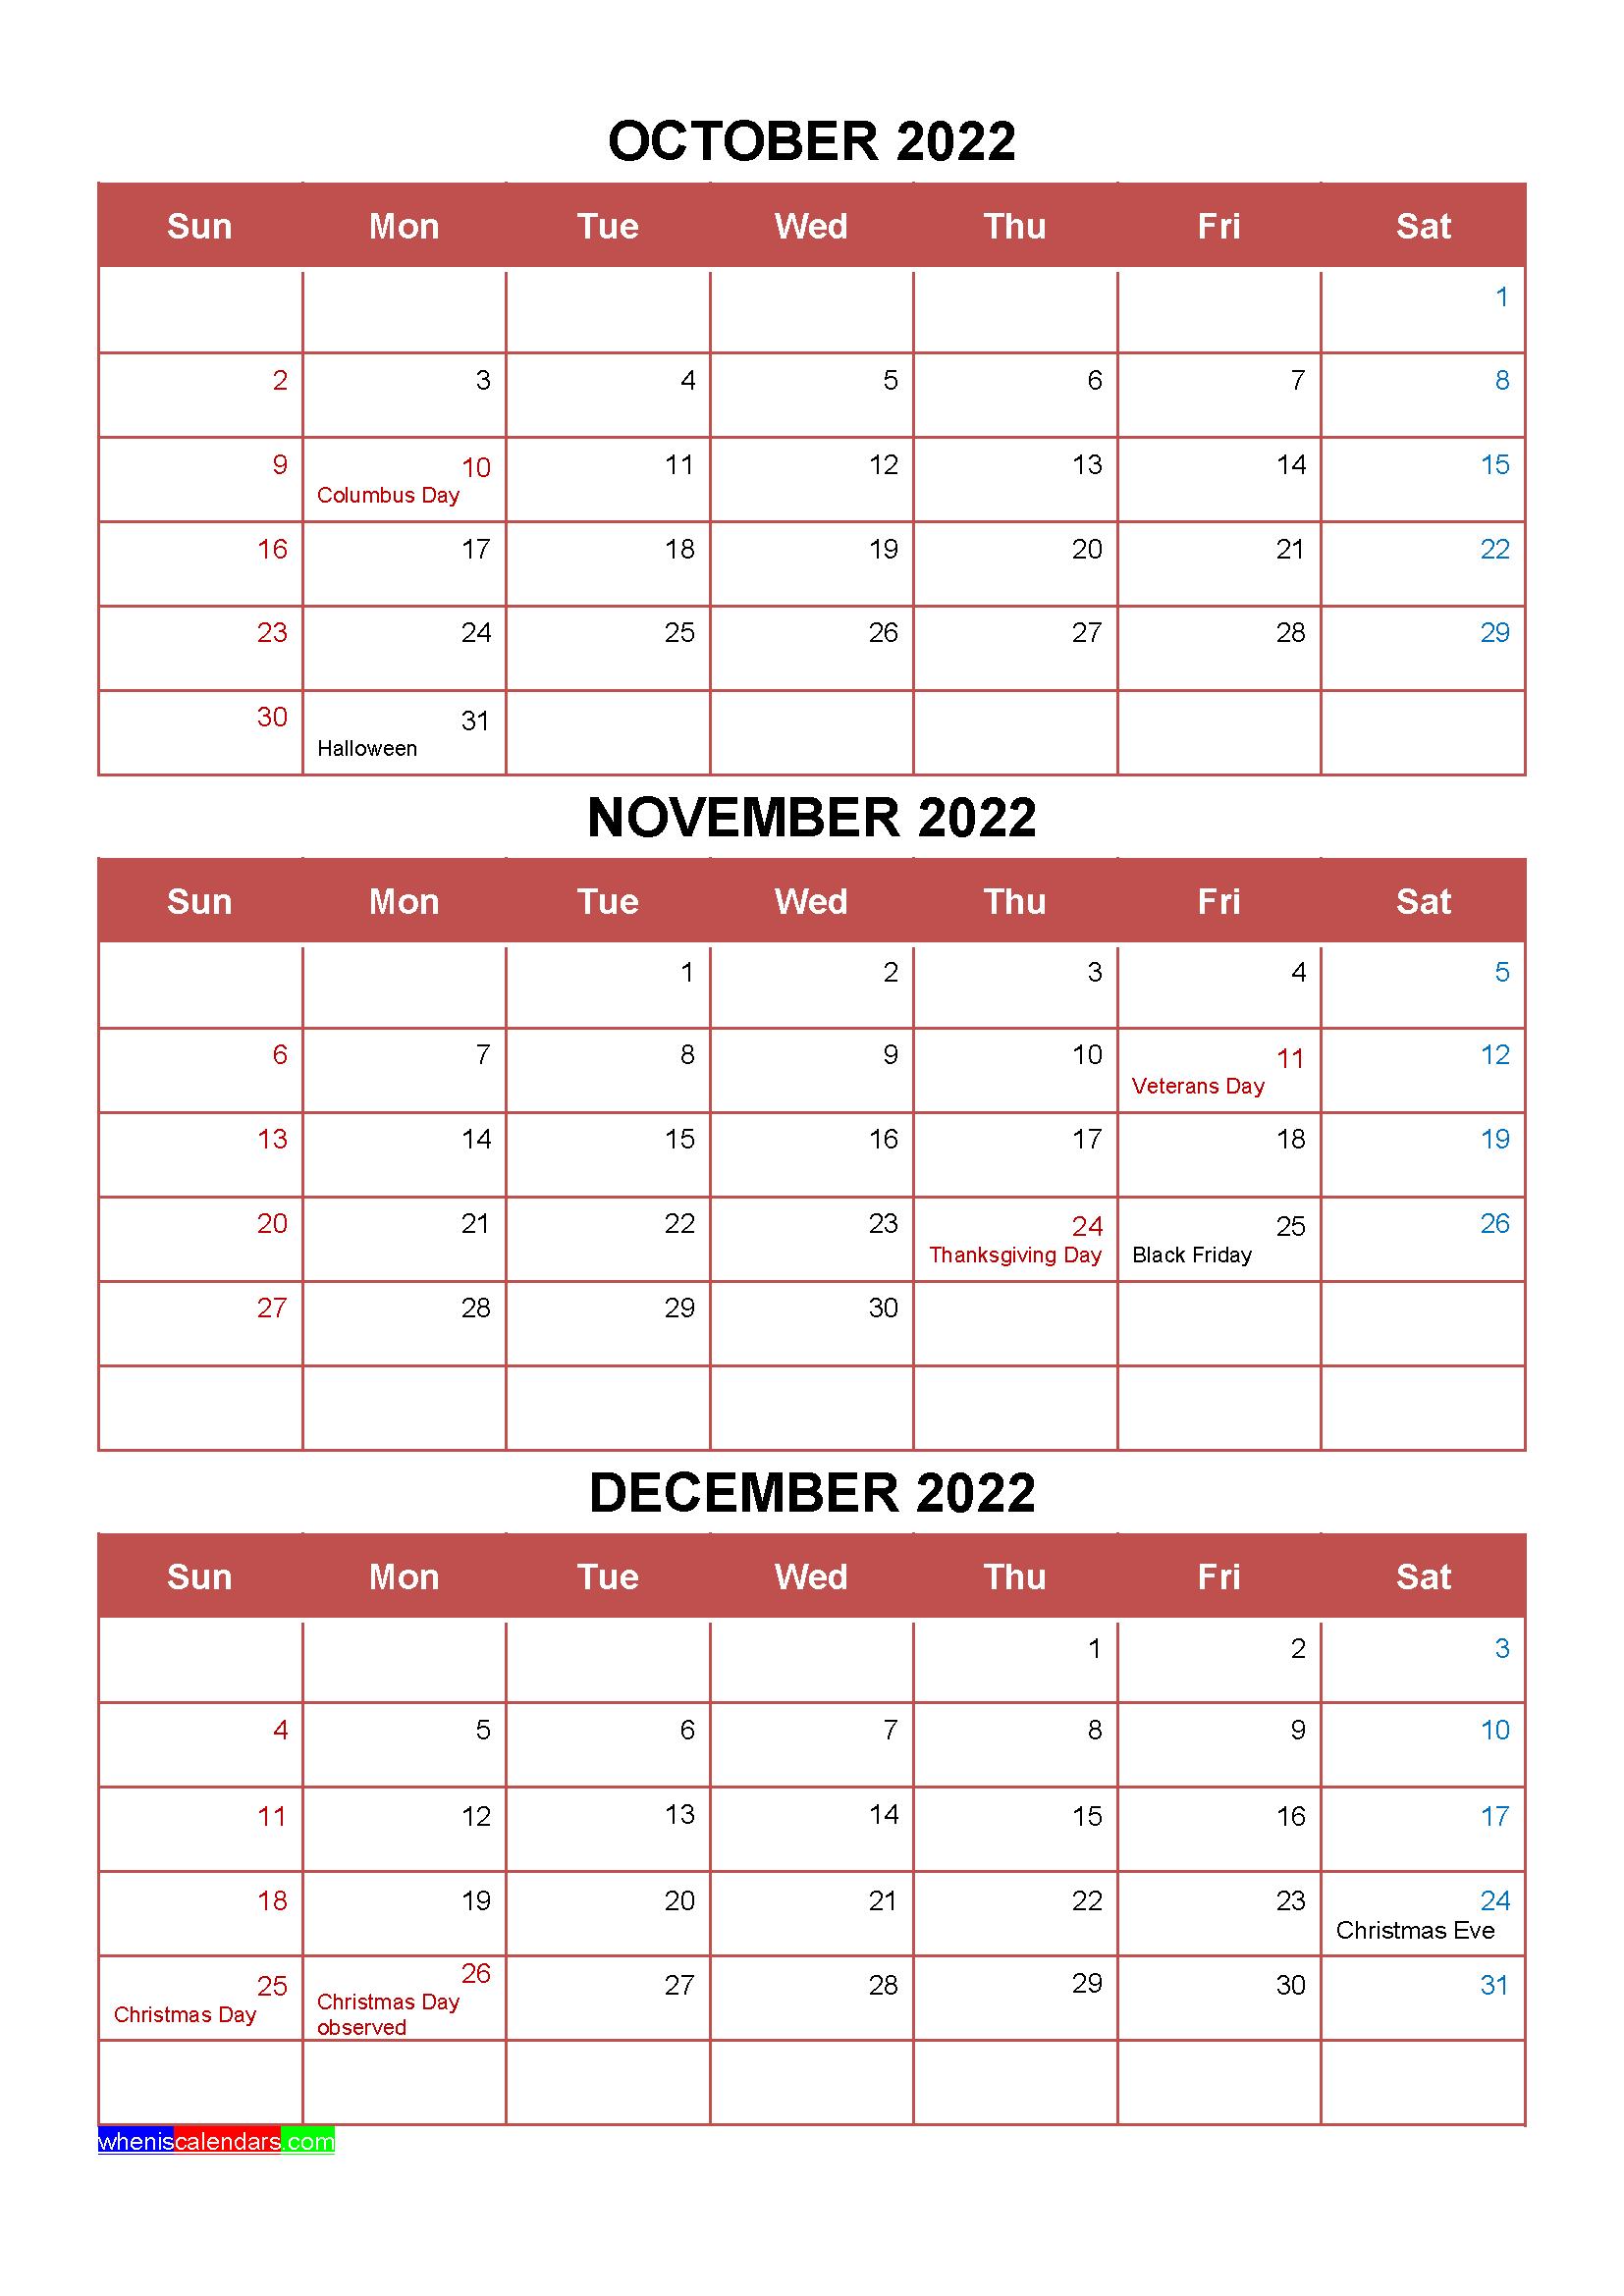 Free October November December 2022 Calendar with Holidays